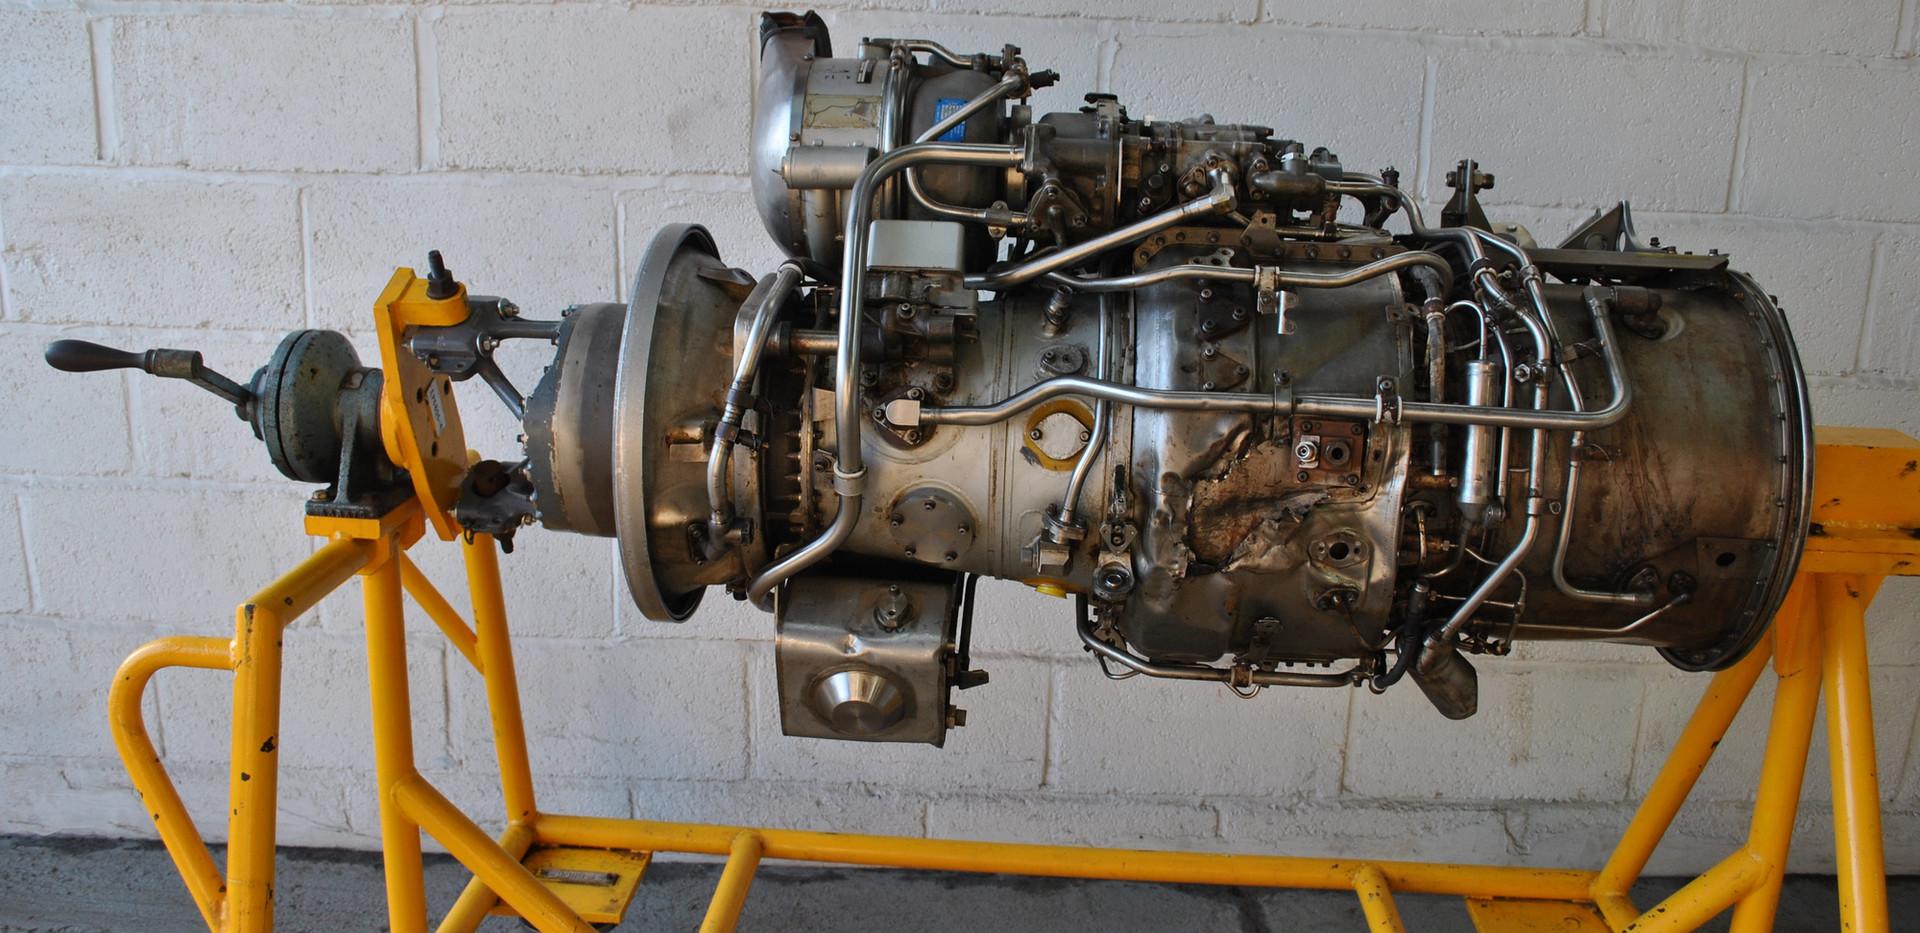 Rolls Royce Gem Engine in Stand (30).JPG